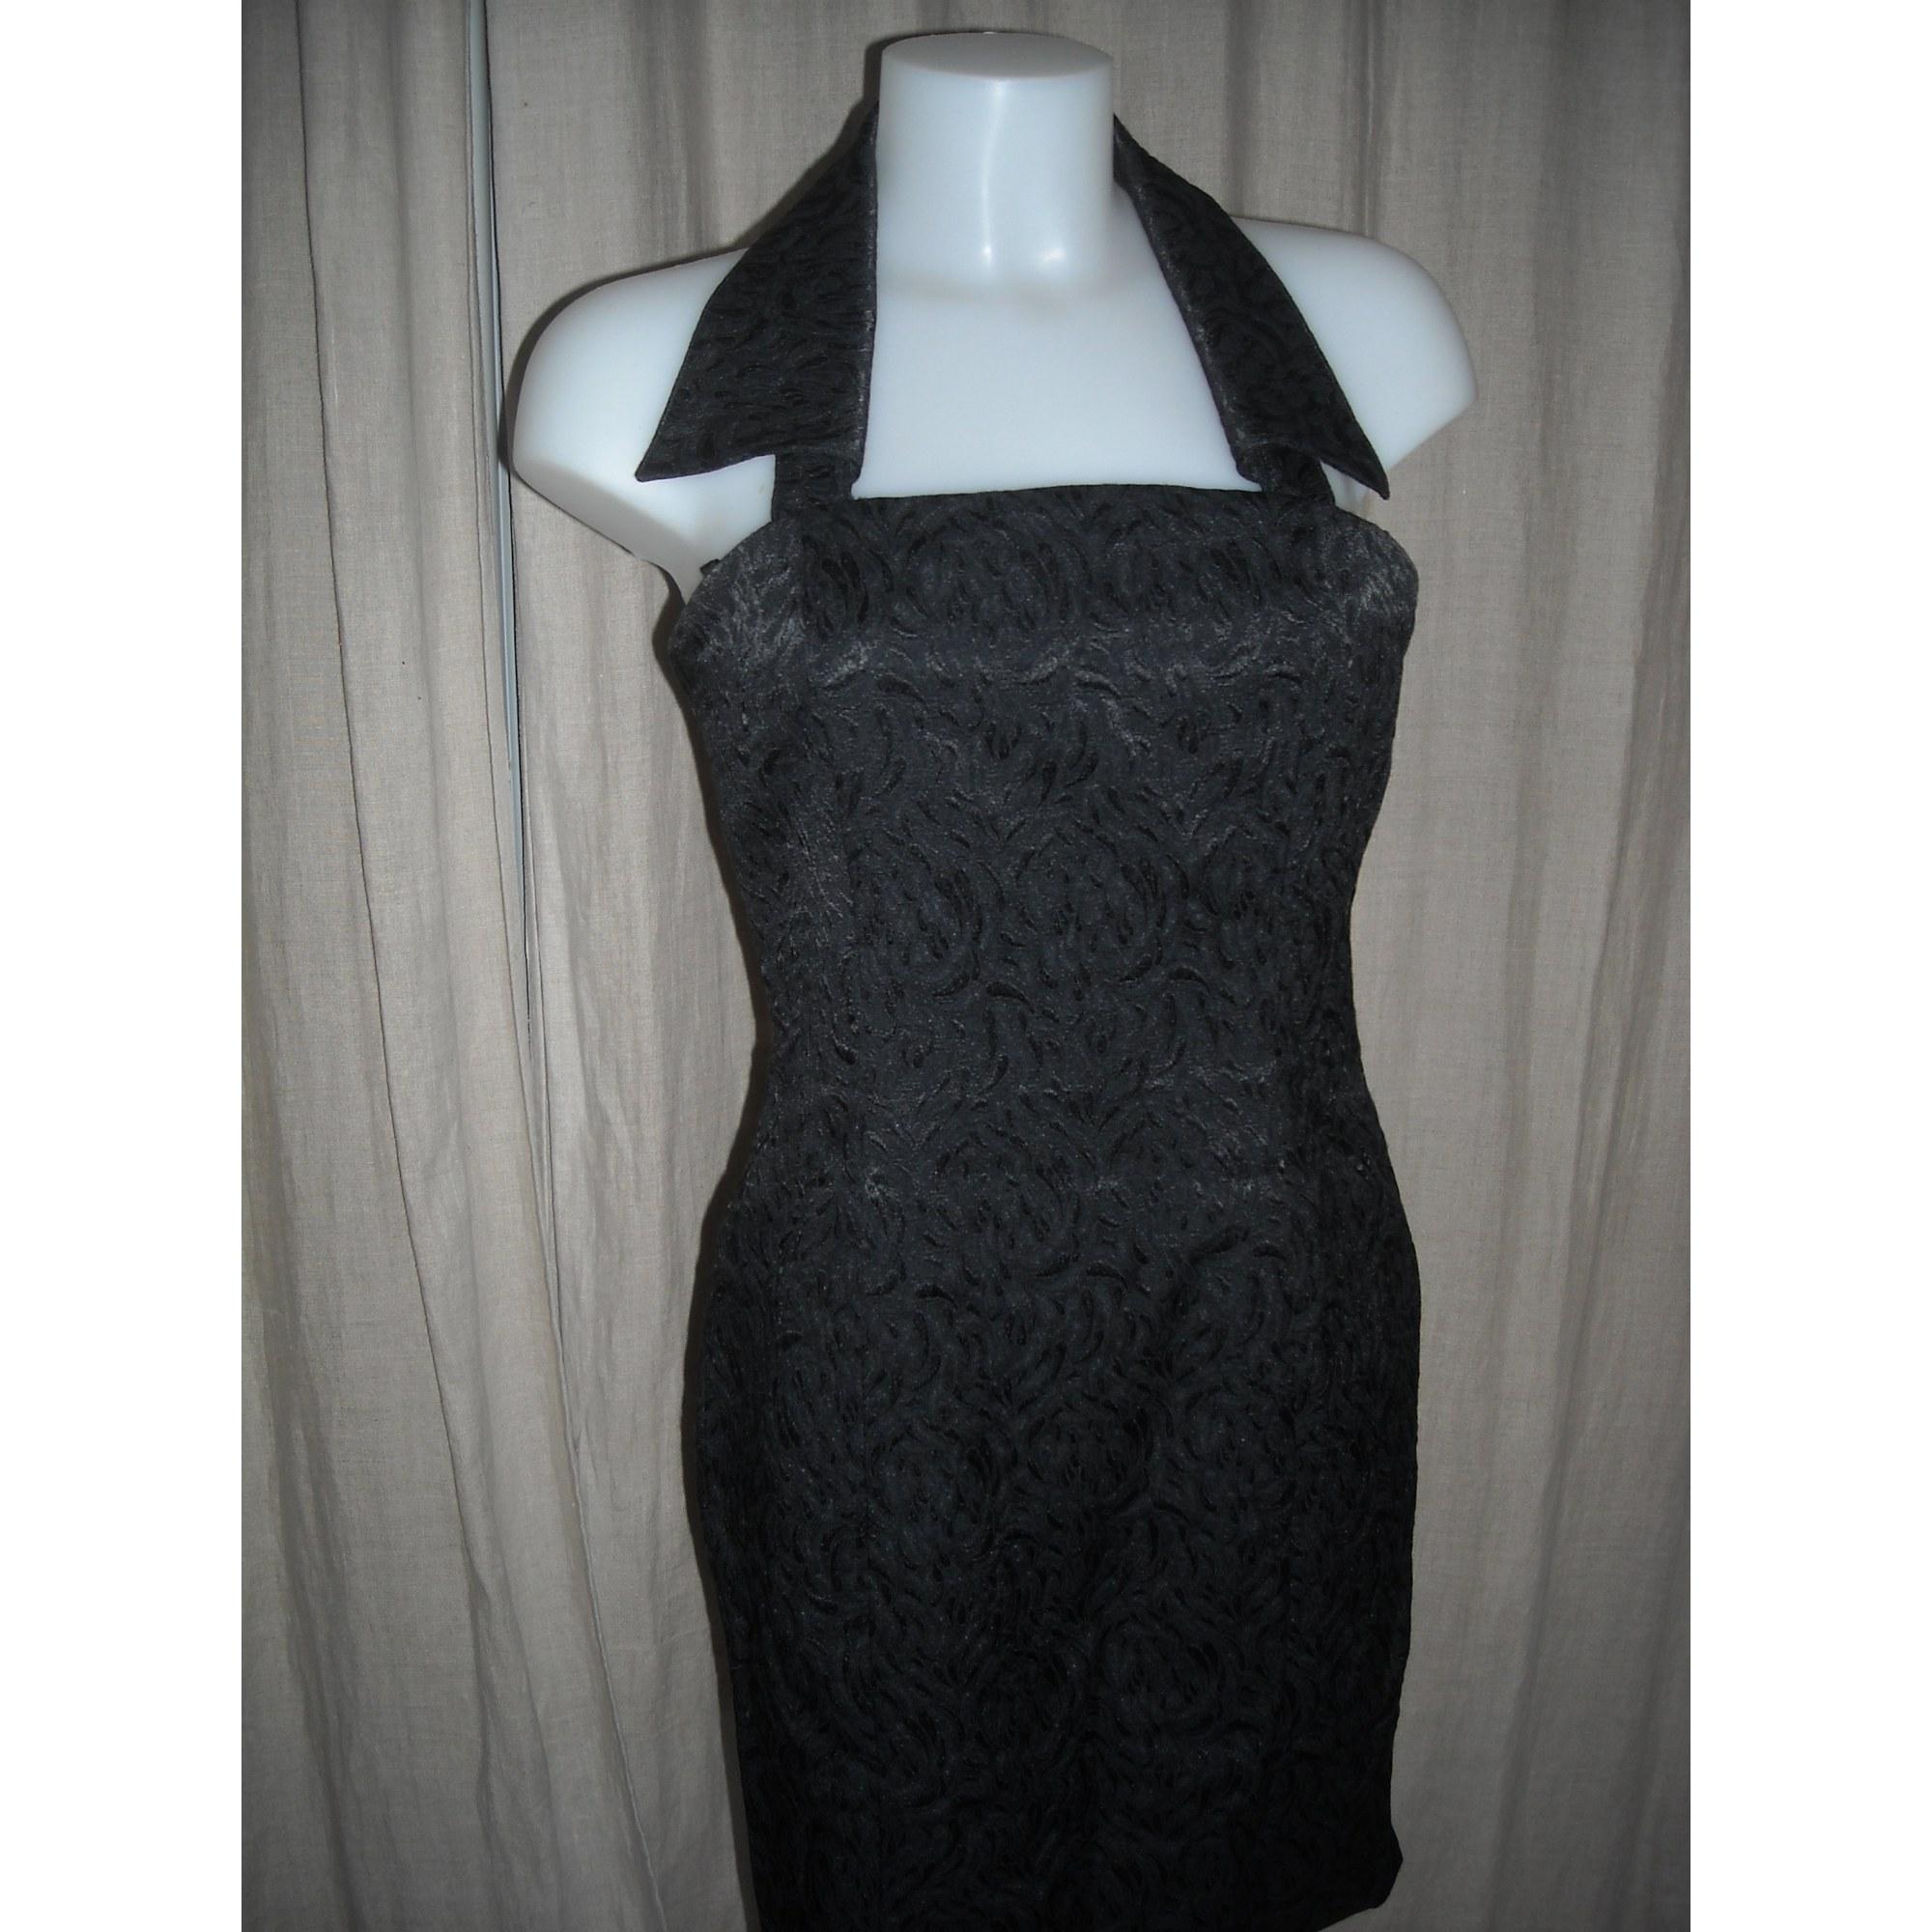 7993c387ef6 Robe bustier LILIANE H 40 (L